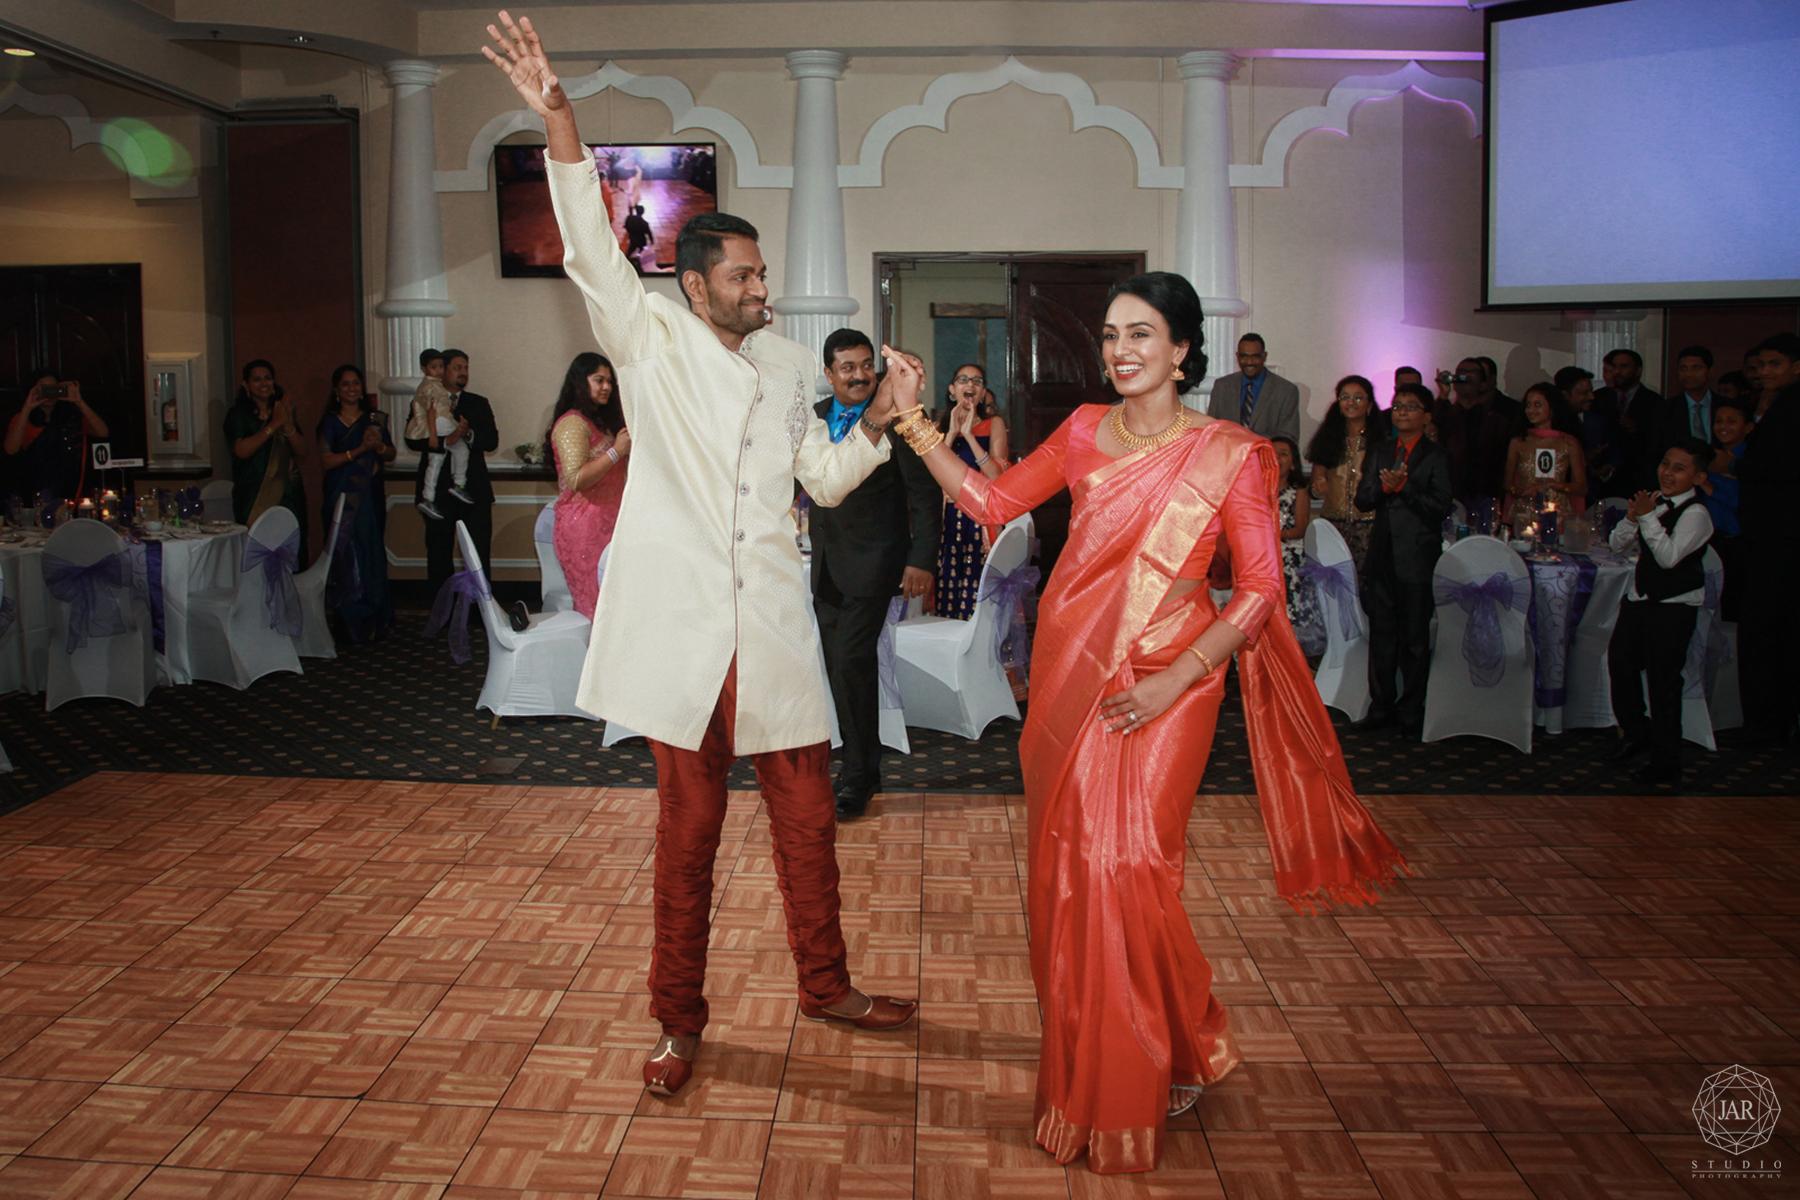 33-traditional-indian-wedding-saree-reception-venues-orlando-fl-photographer.jpg